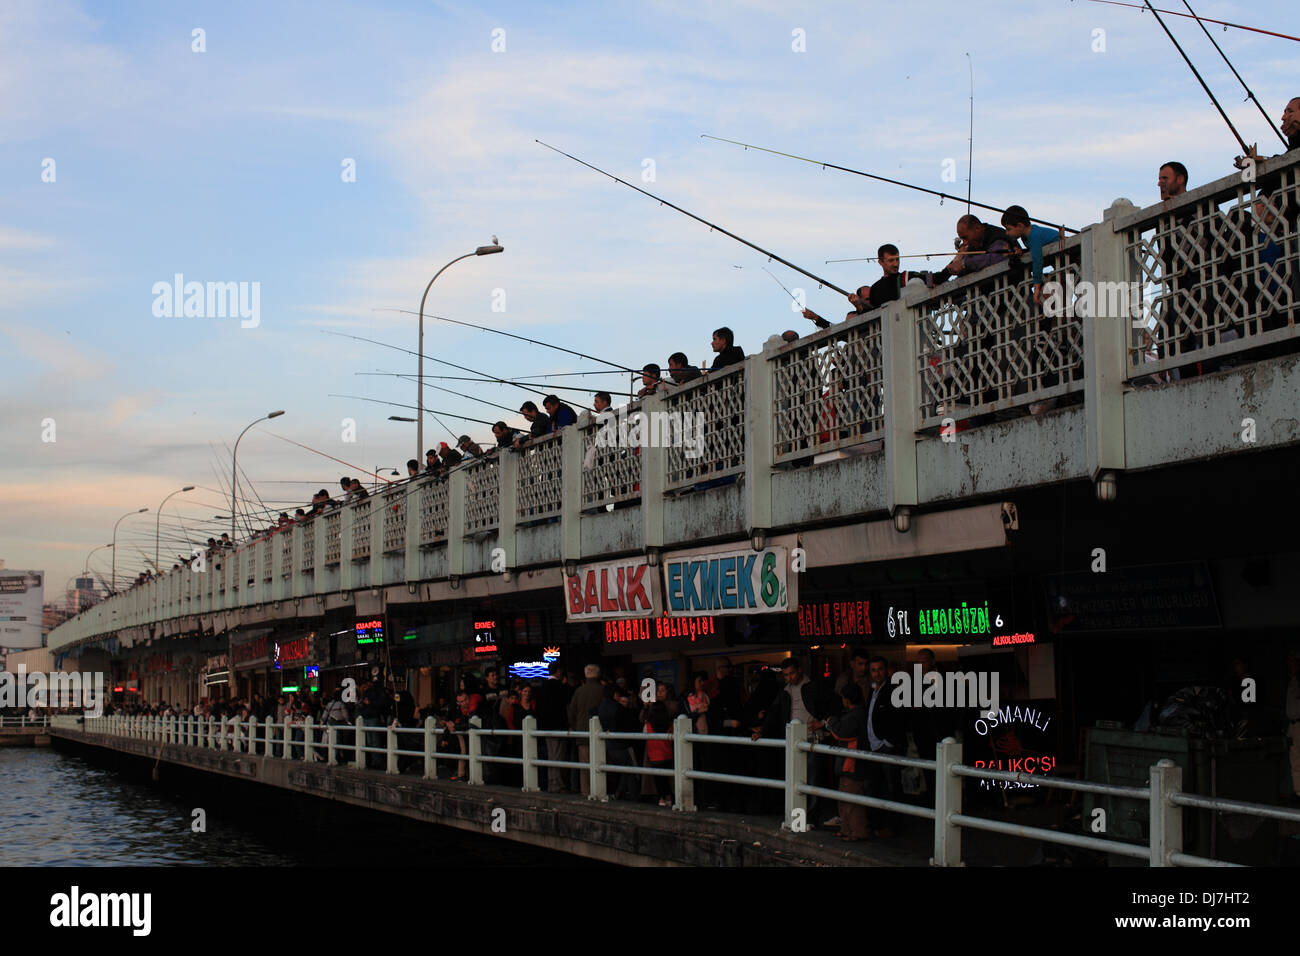 Men fishing from bridge over the Bosphorus in the Golden Horn - Stock Image